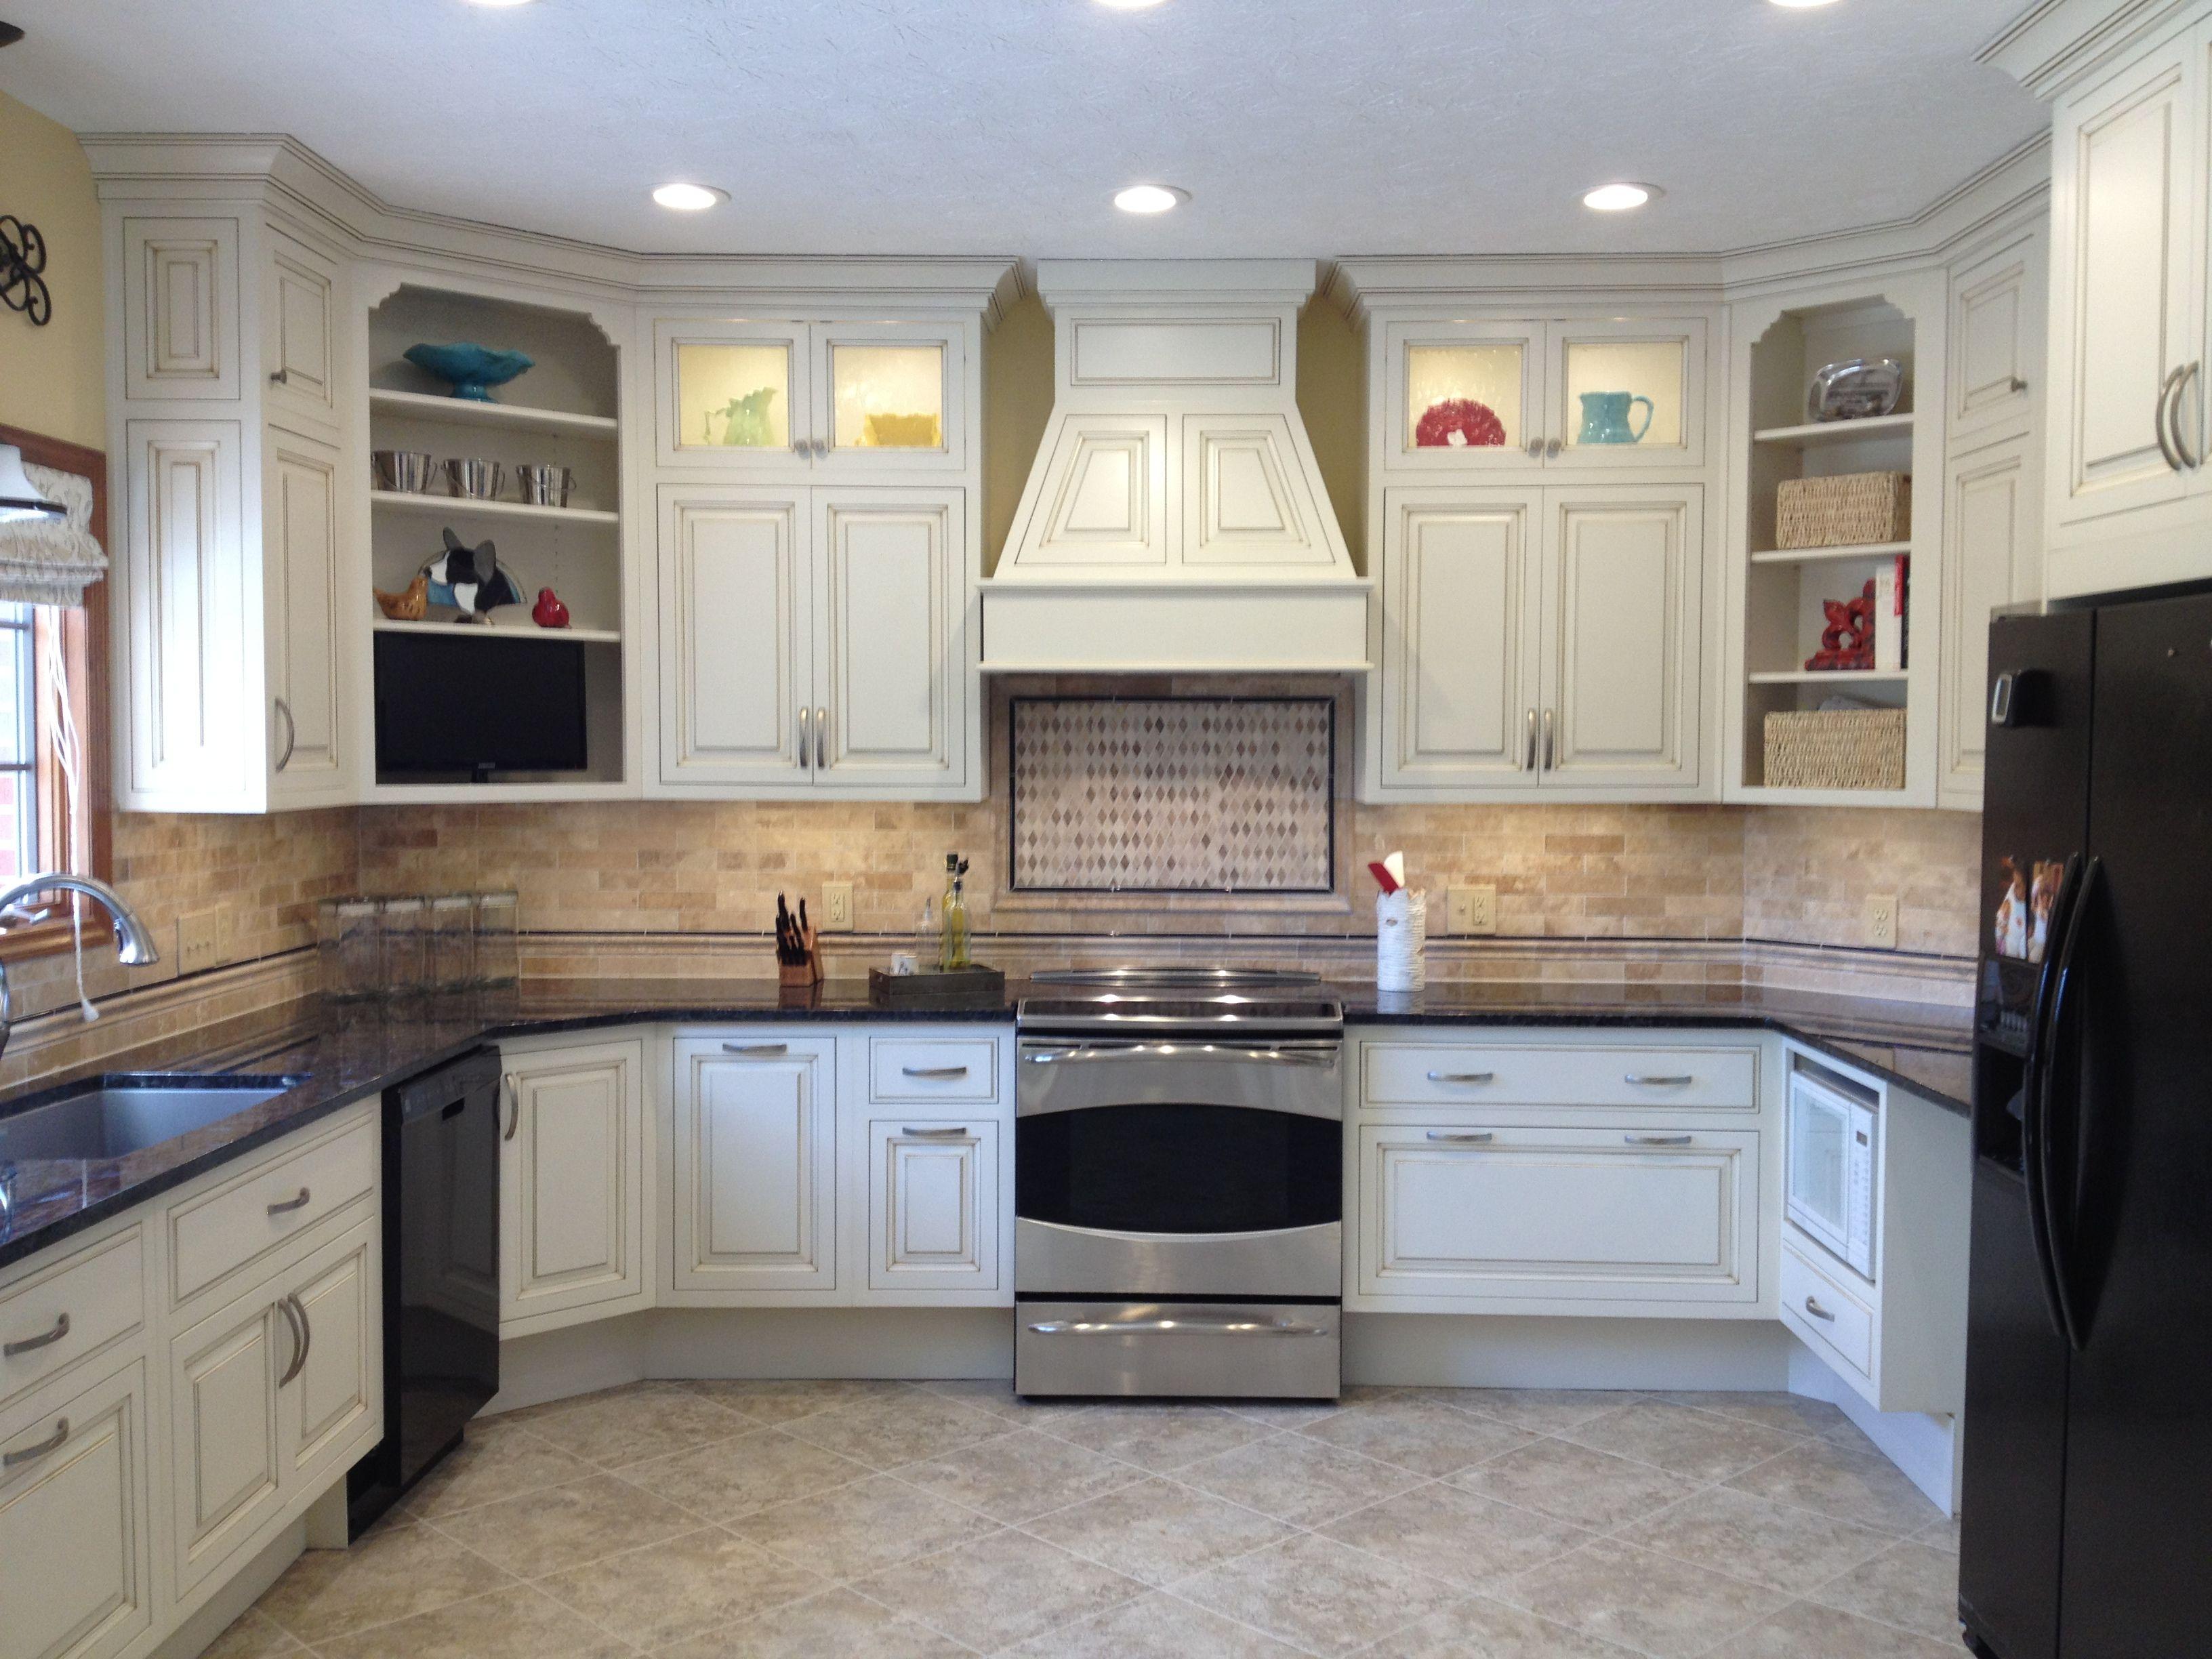 Kitchen Renovation by Adaptations in Dayton, Ohio. ADA ...